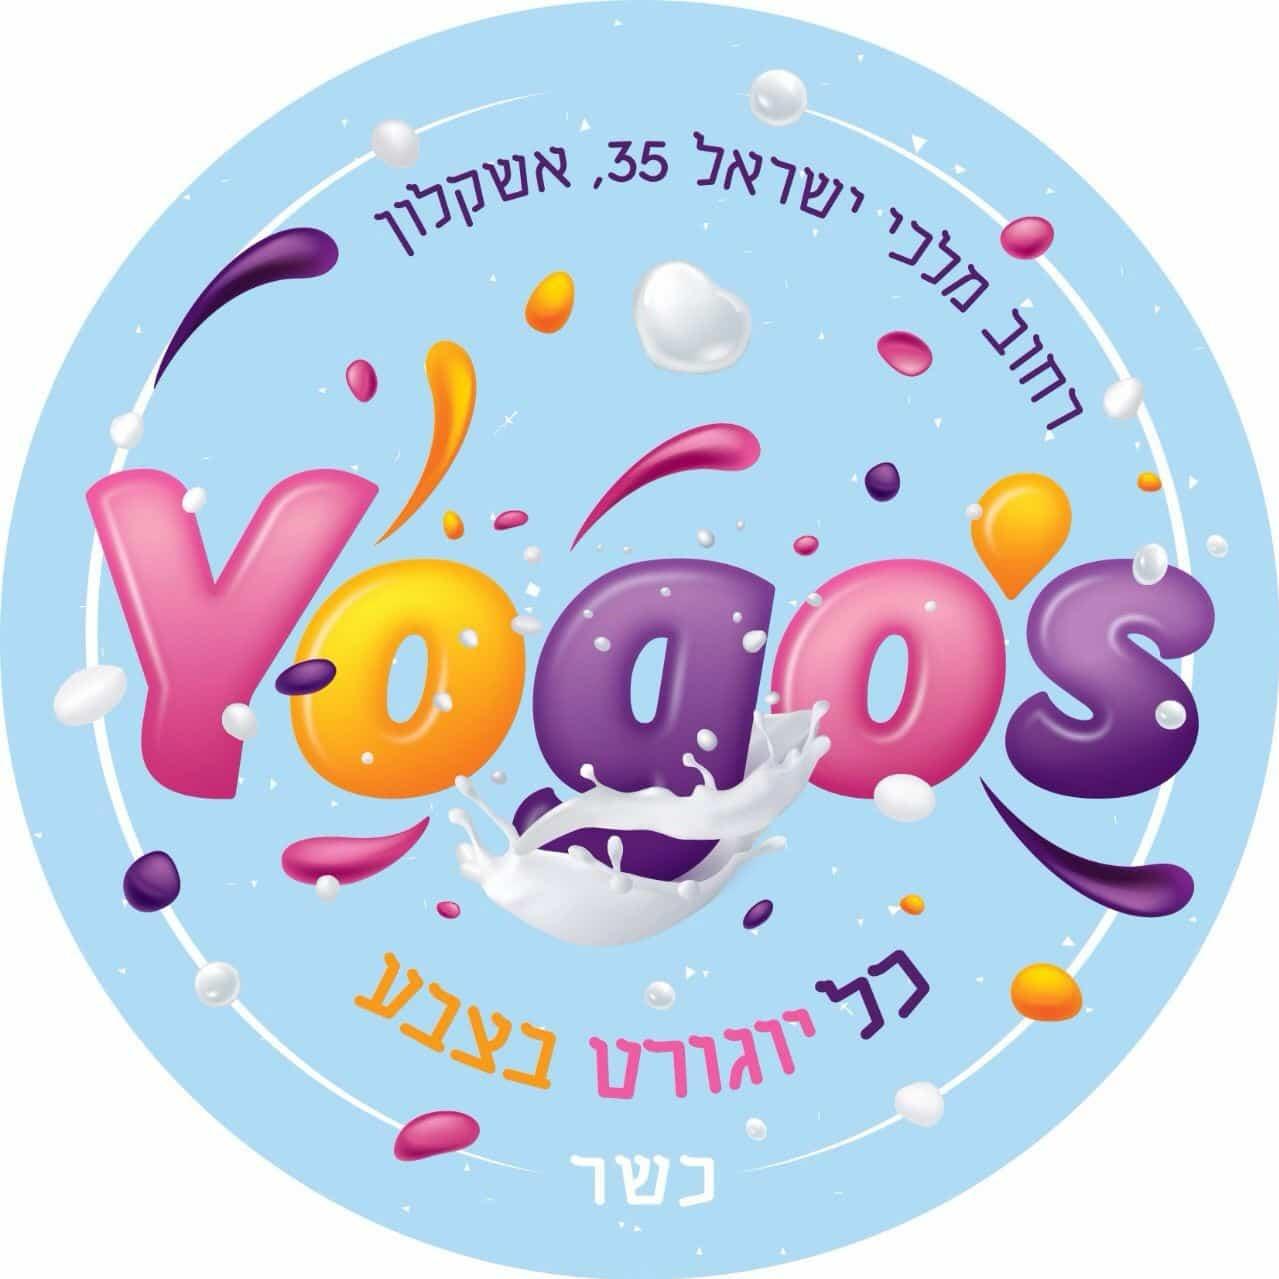 Yogo's יוגוס